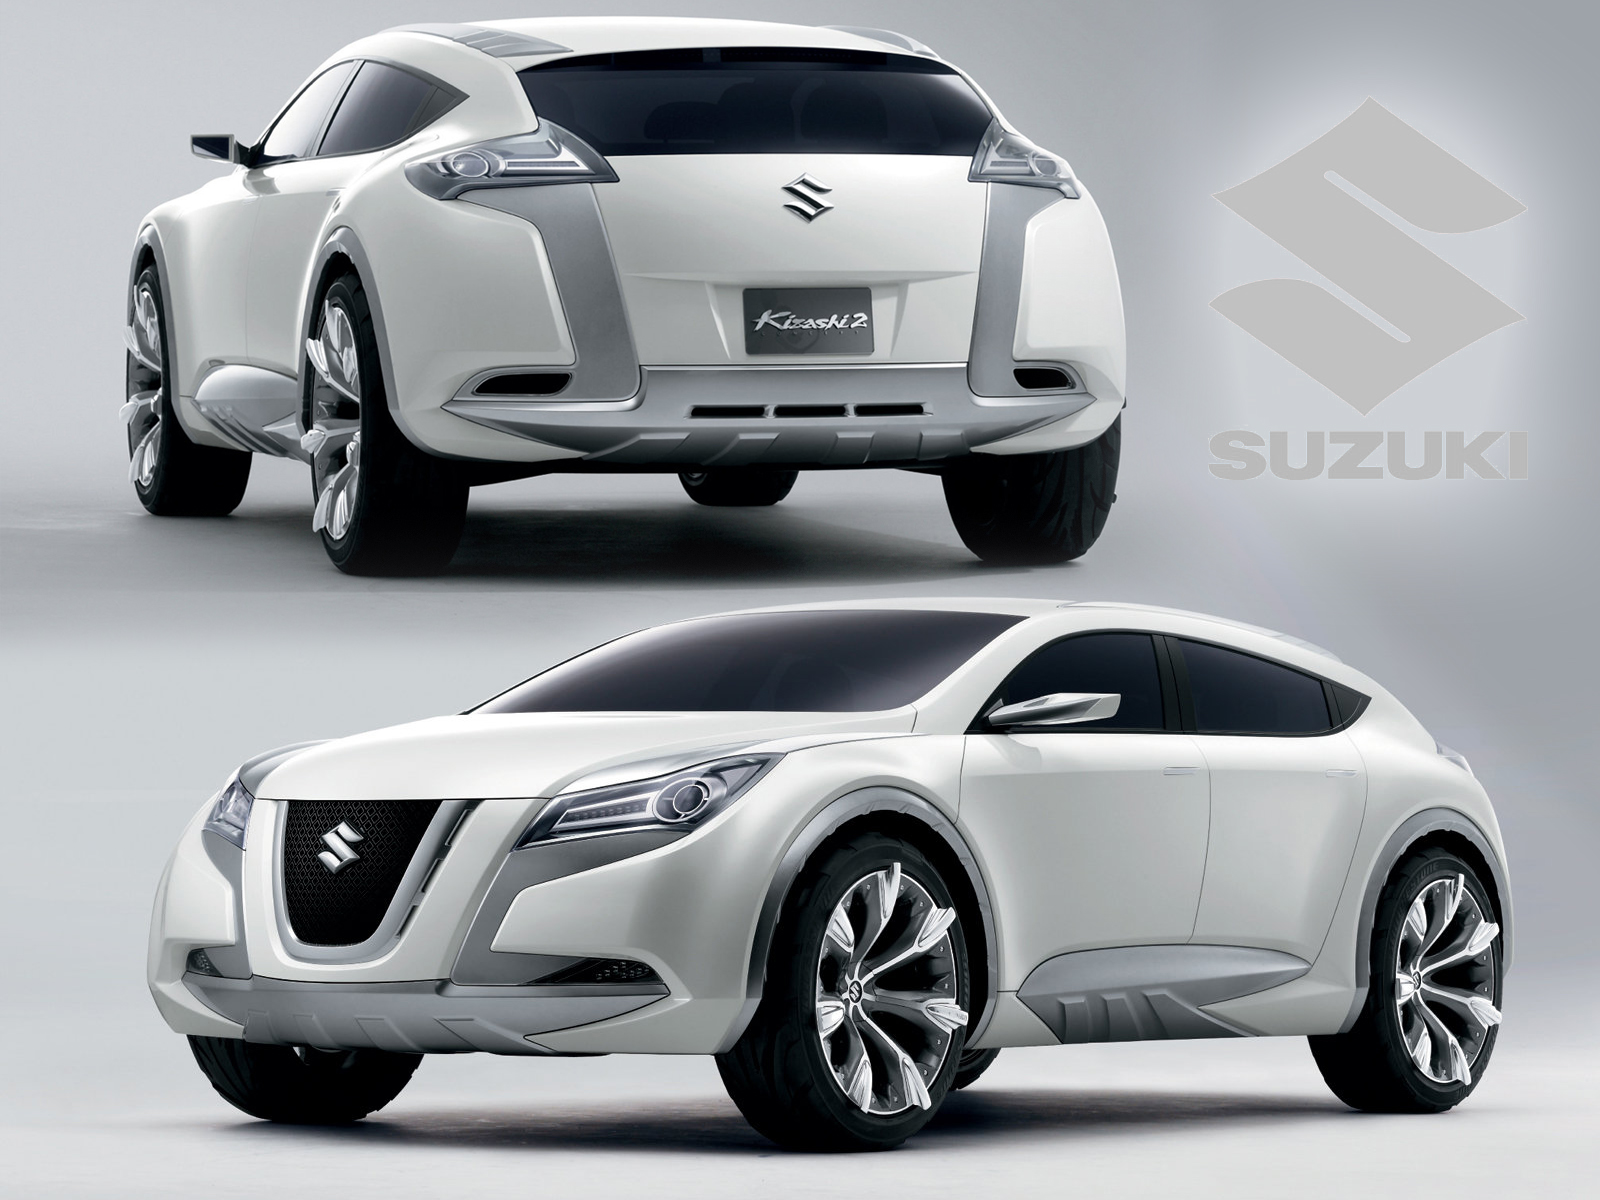 Suzuki Kizashi India